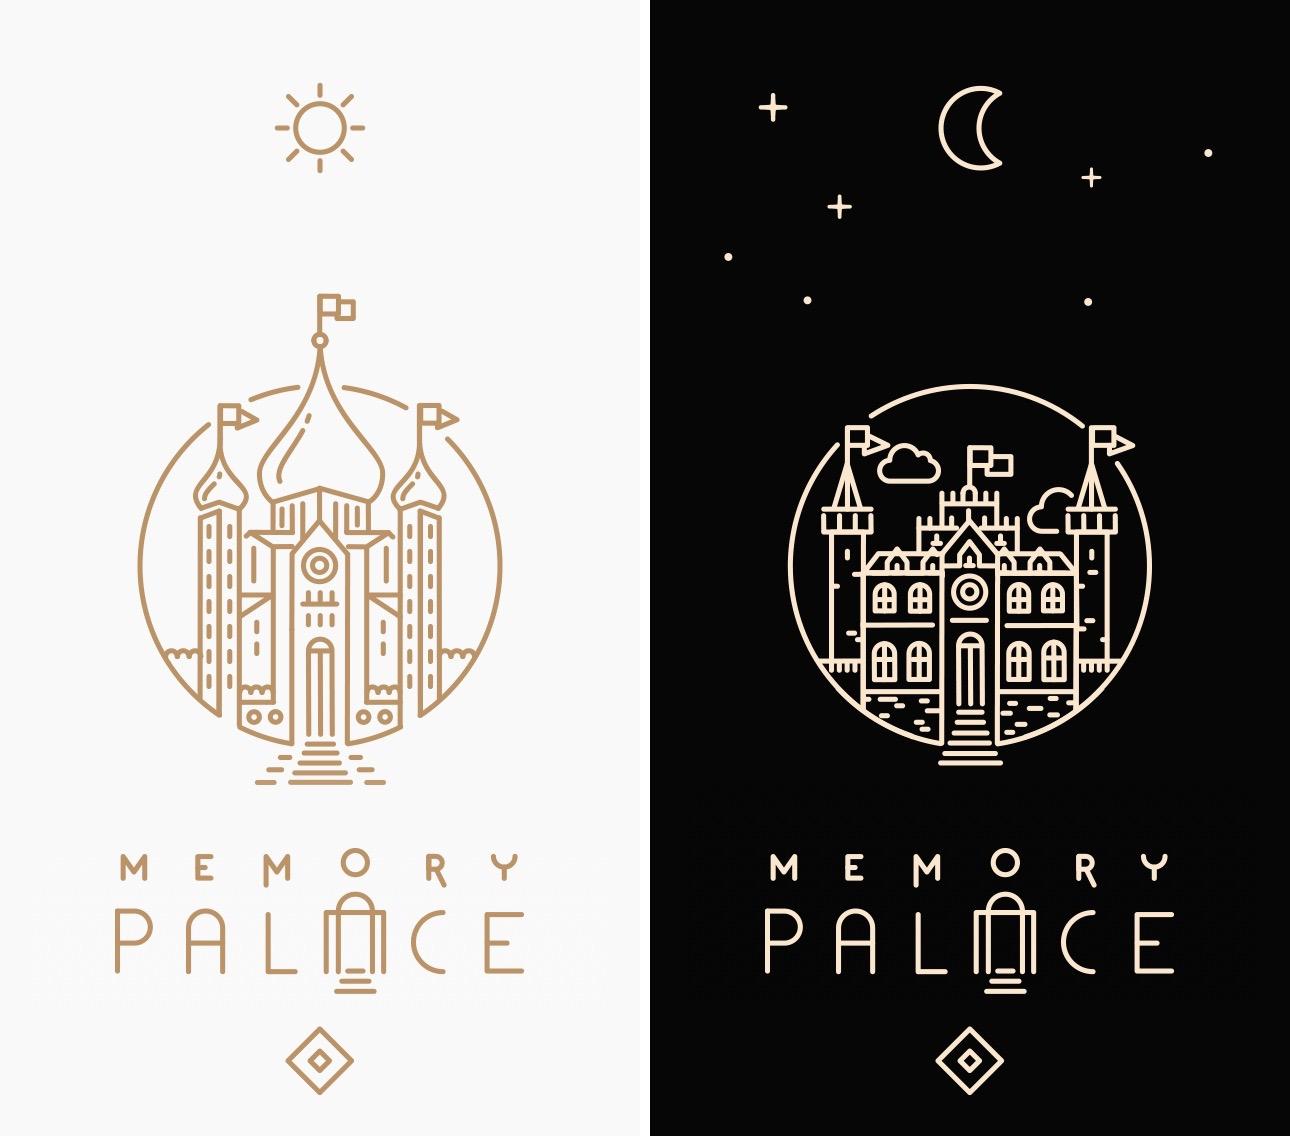 Memory Palace Game 1